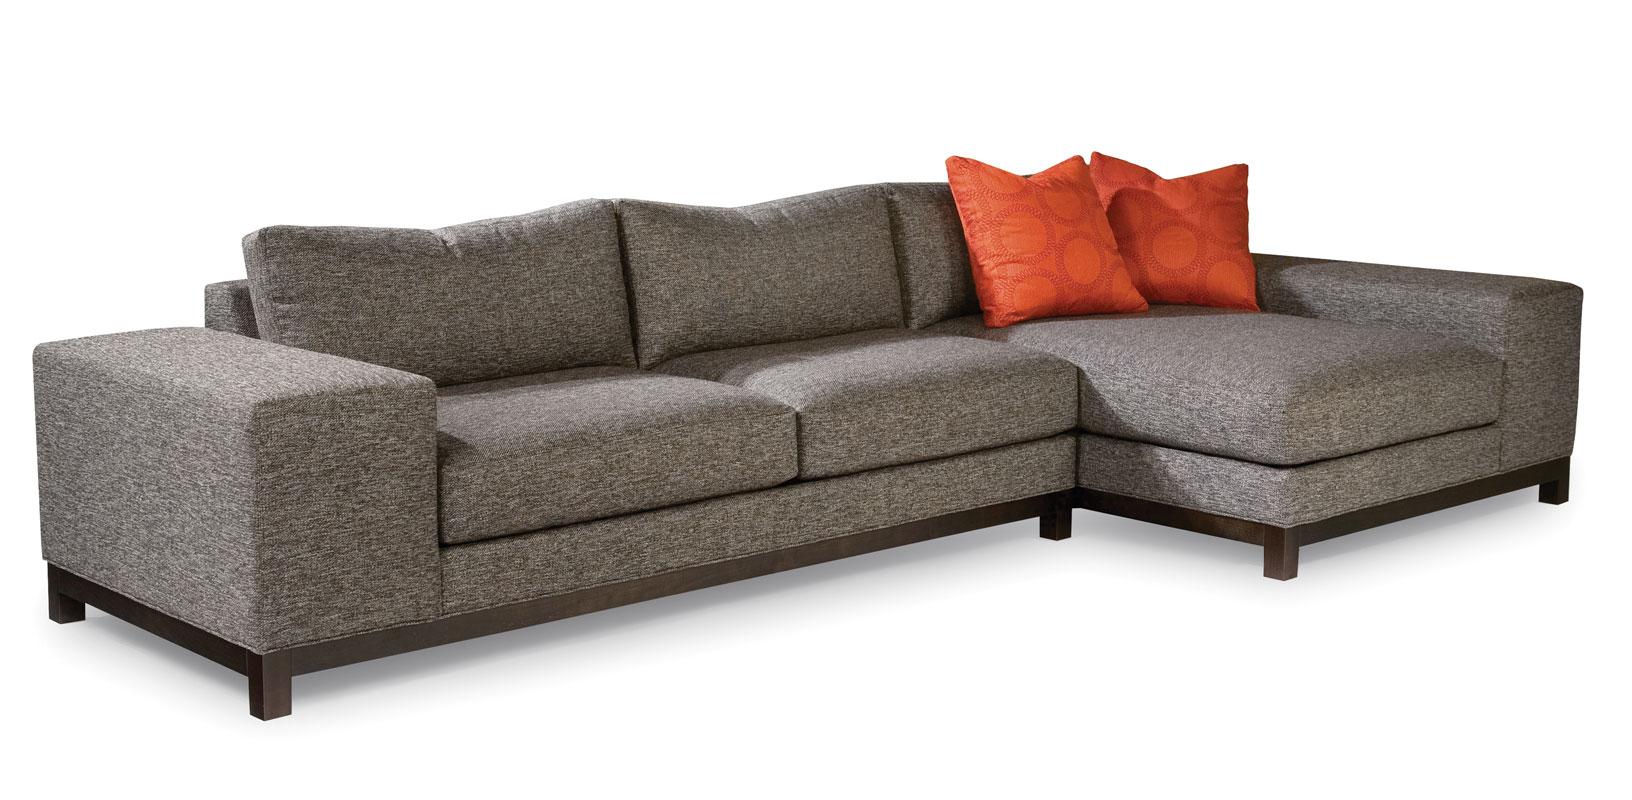 thayer coggin clip sofa small bedroom uk products ohio hardwood furniture